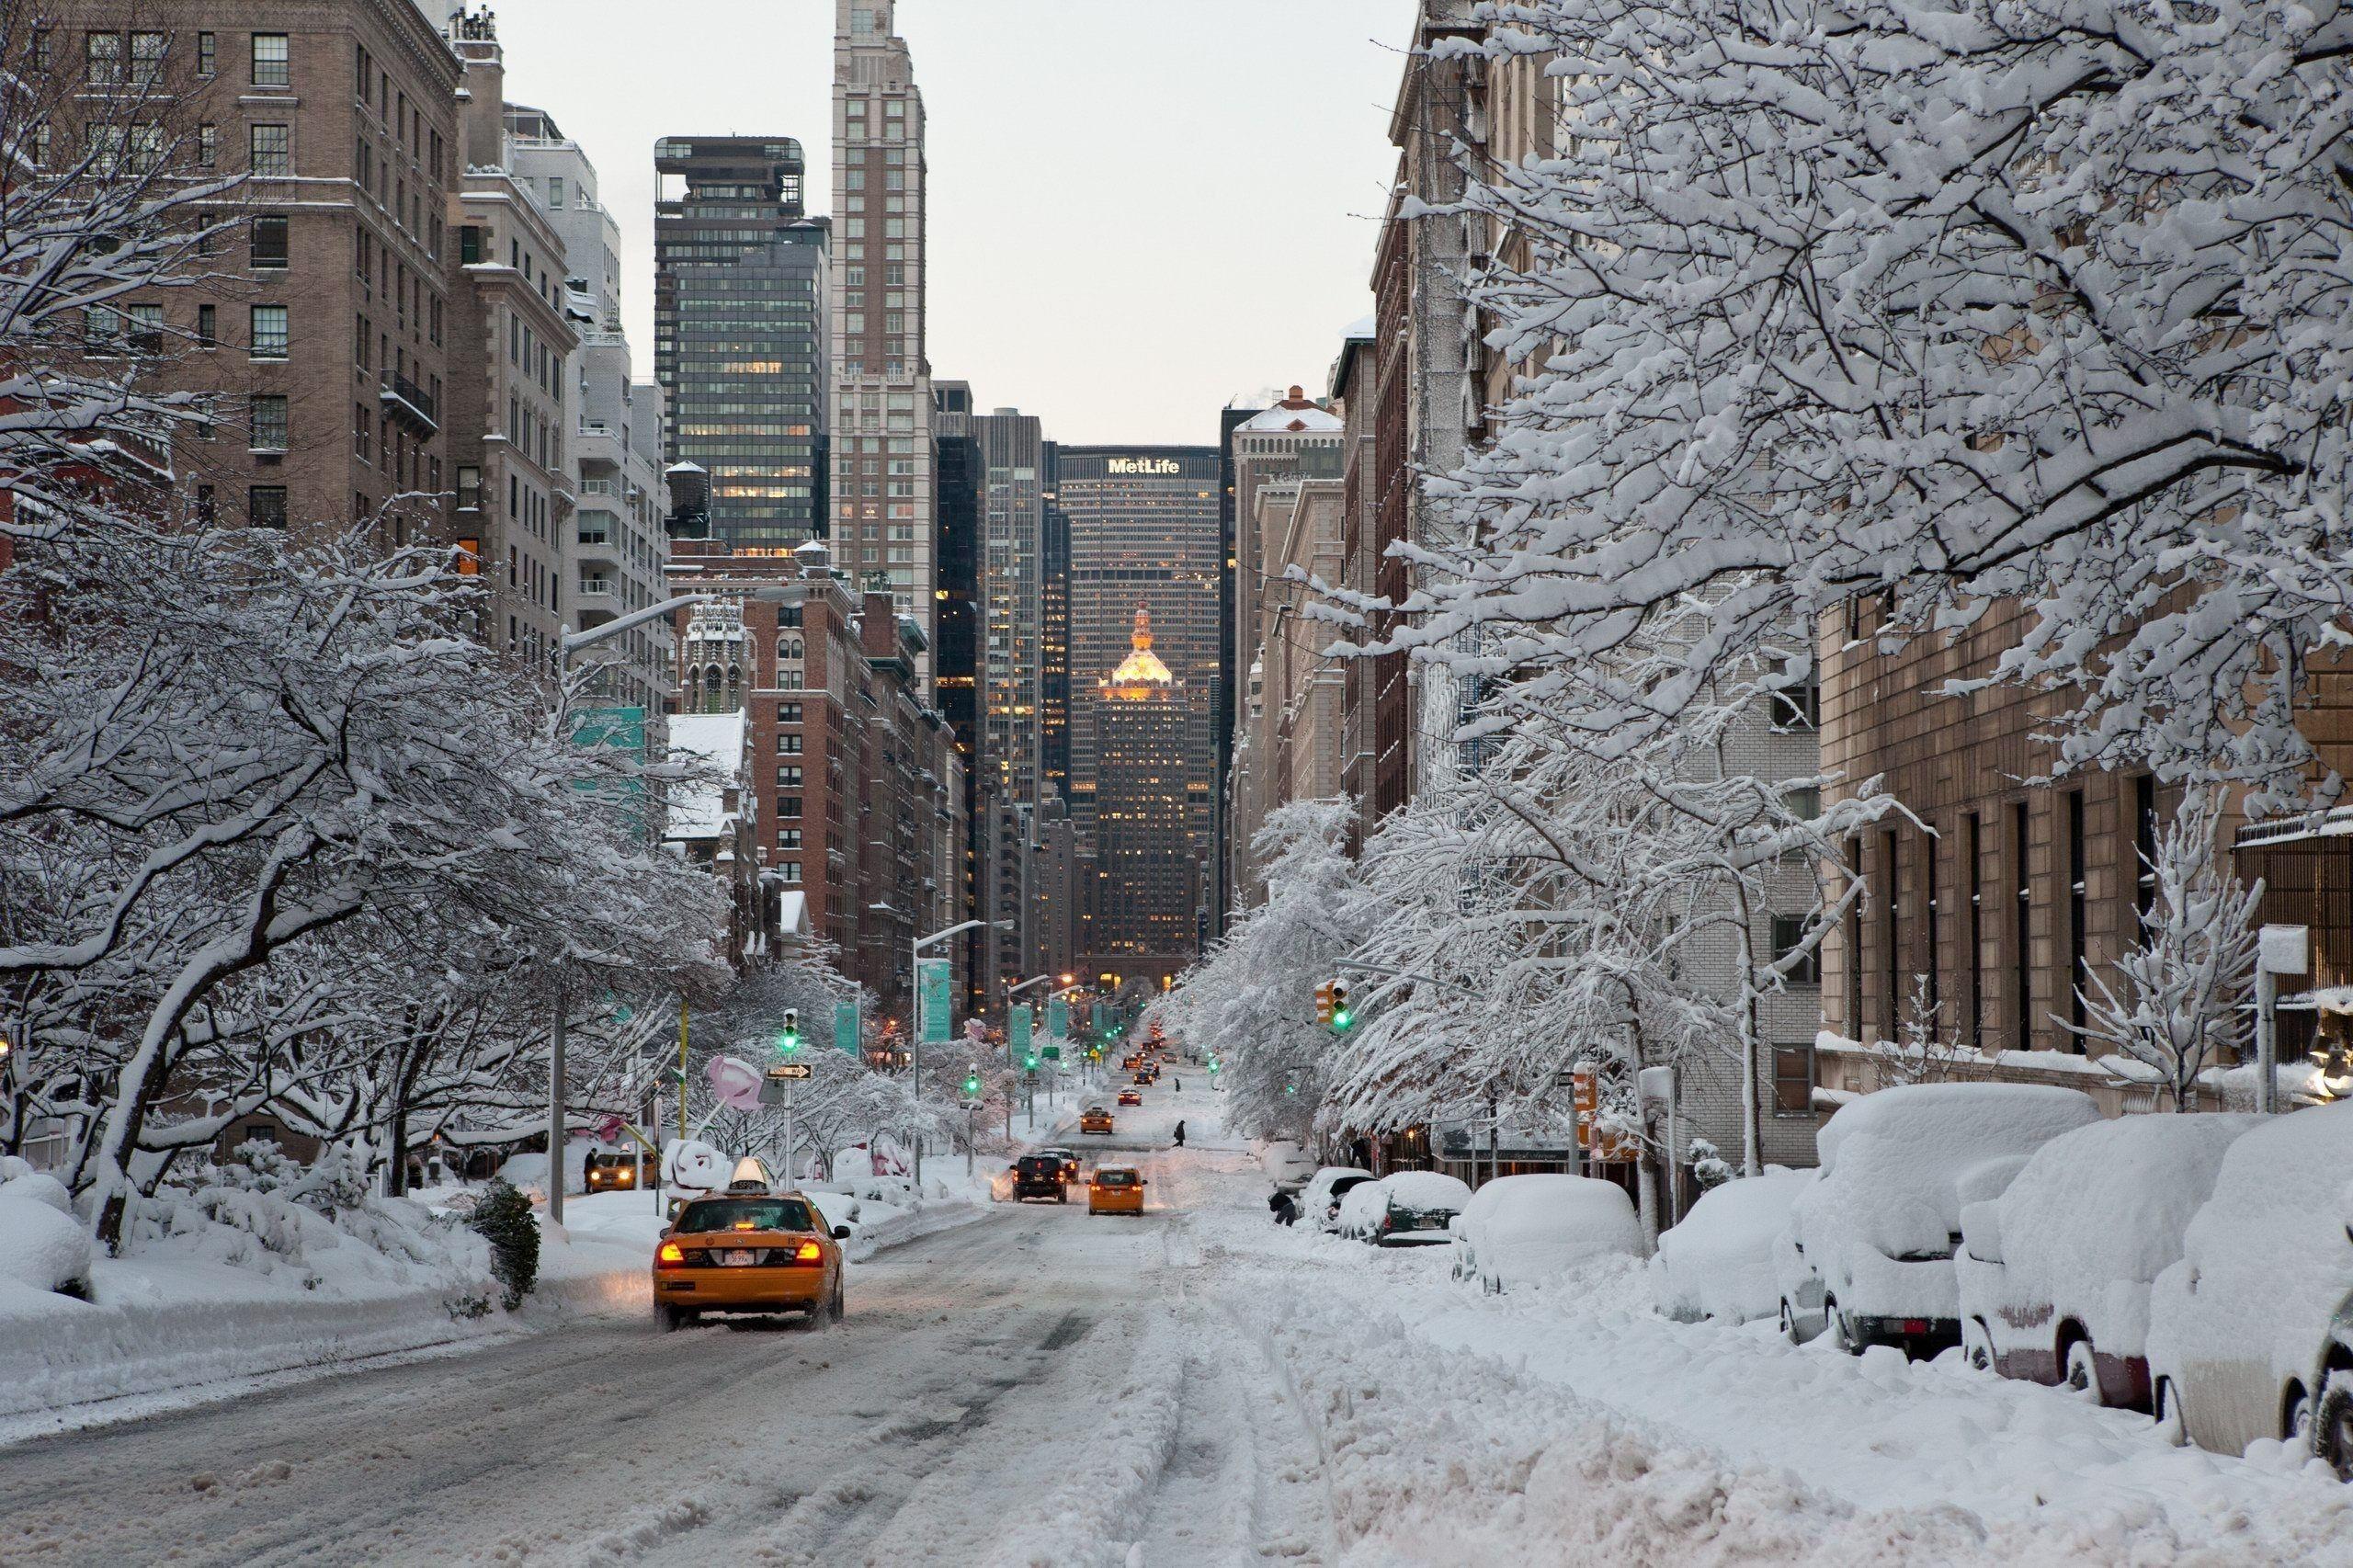 New York Winter Wallpapers   Top New York Winter Backgrounds 2560x1706